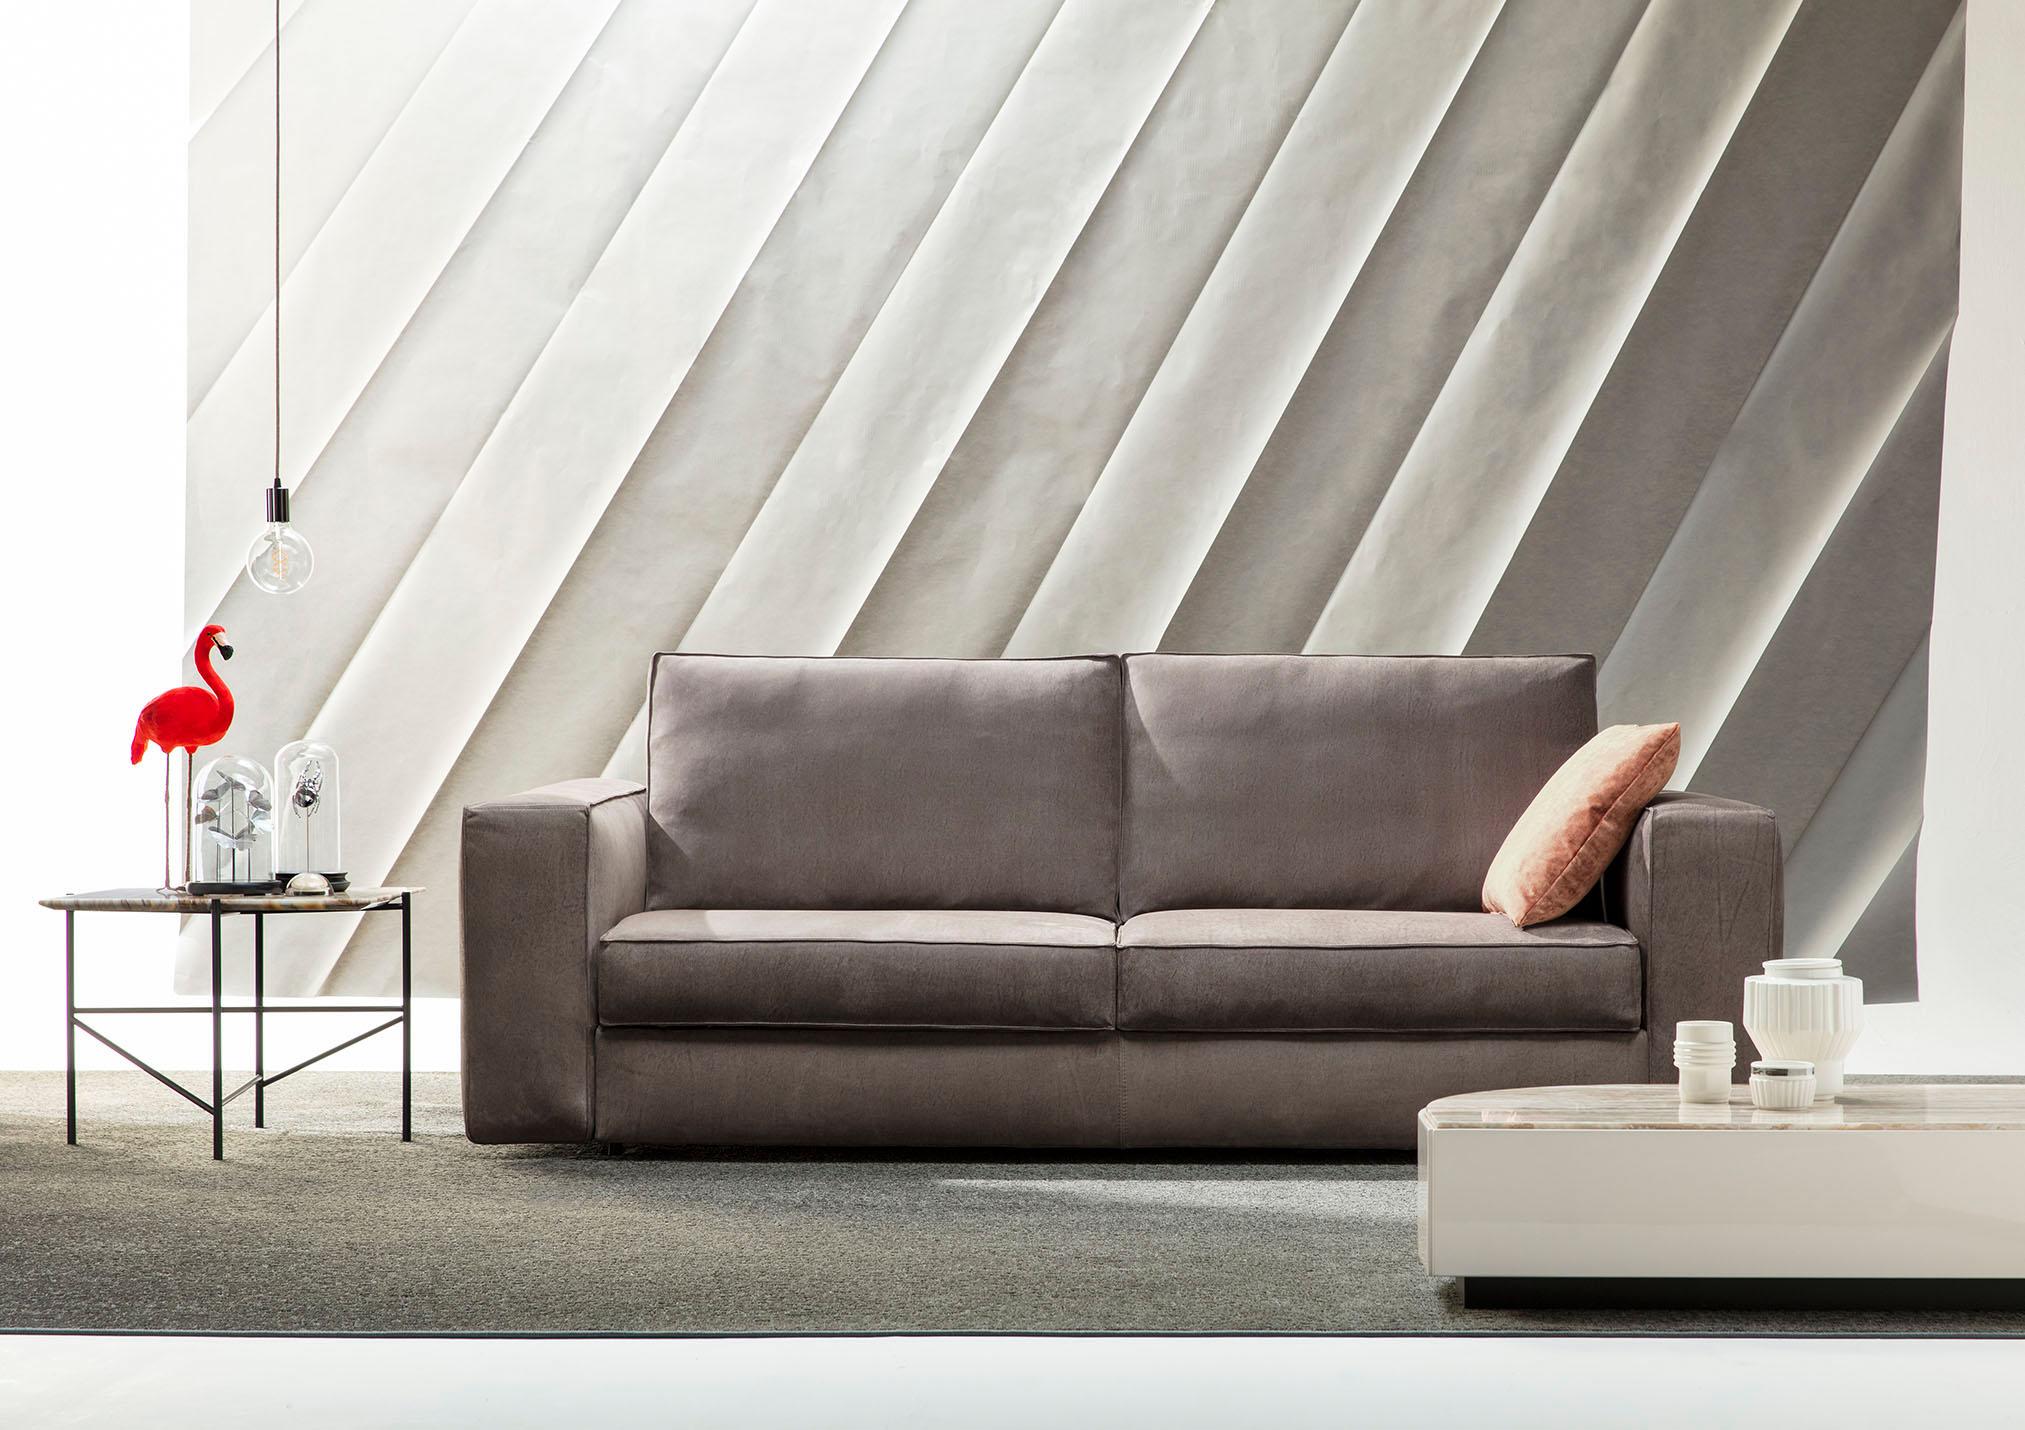 schlafsofa in nubukleder blonde nemo bertostory berto salotti blog. Black Bedroom Furniture Sets. Home Design Ideas